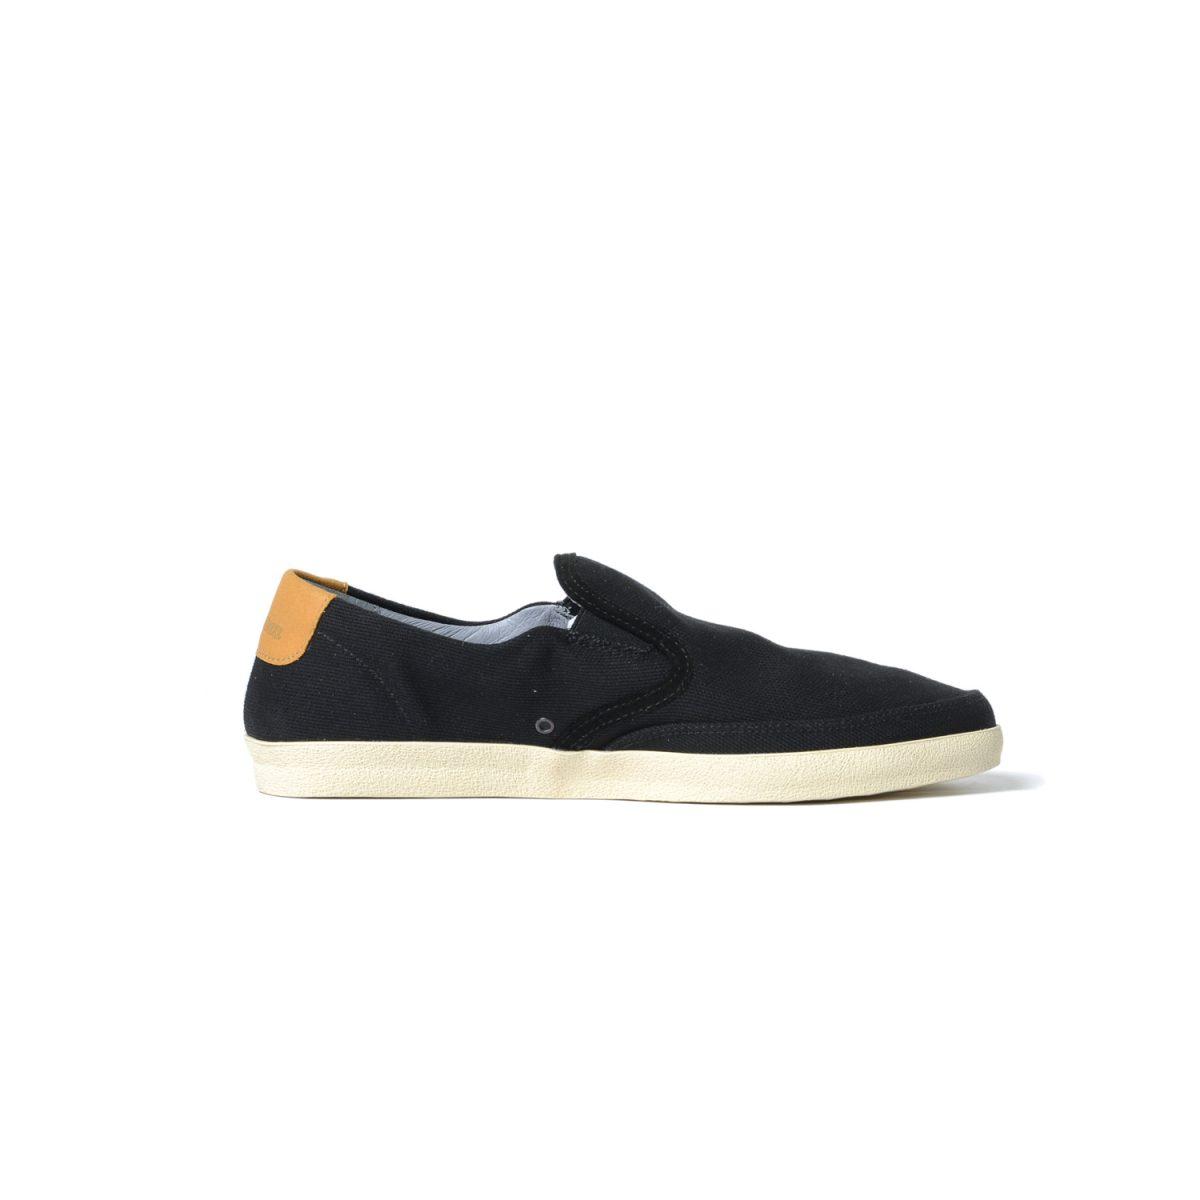 Tisza shoes - Regatta - Black-tobacco